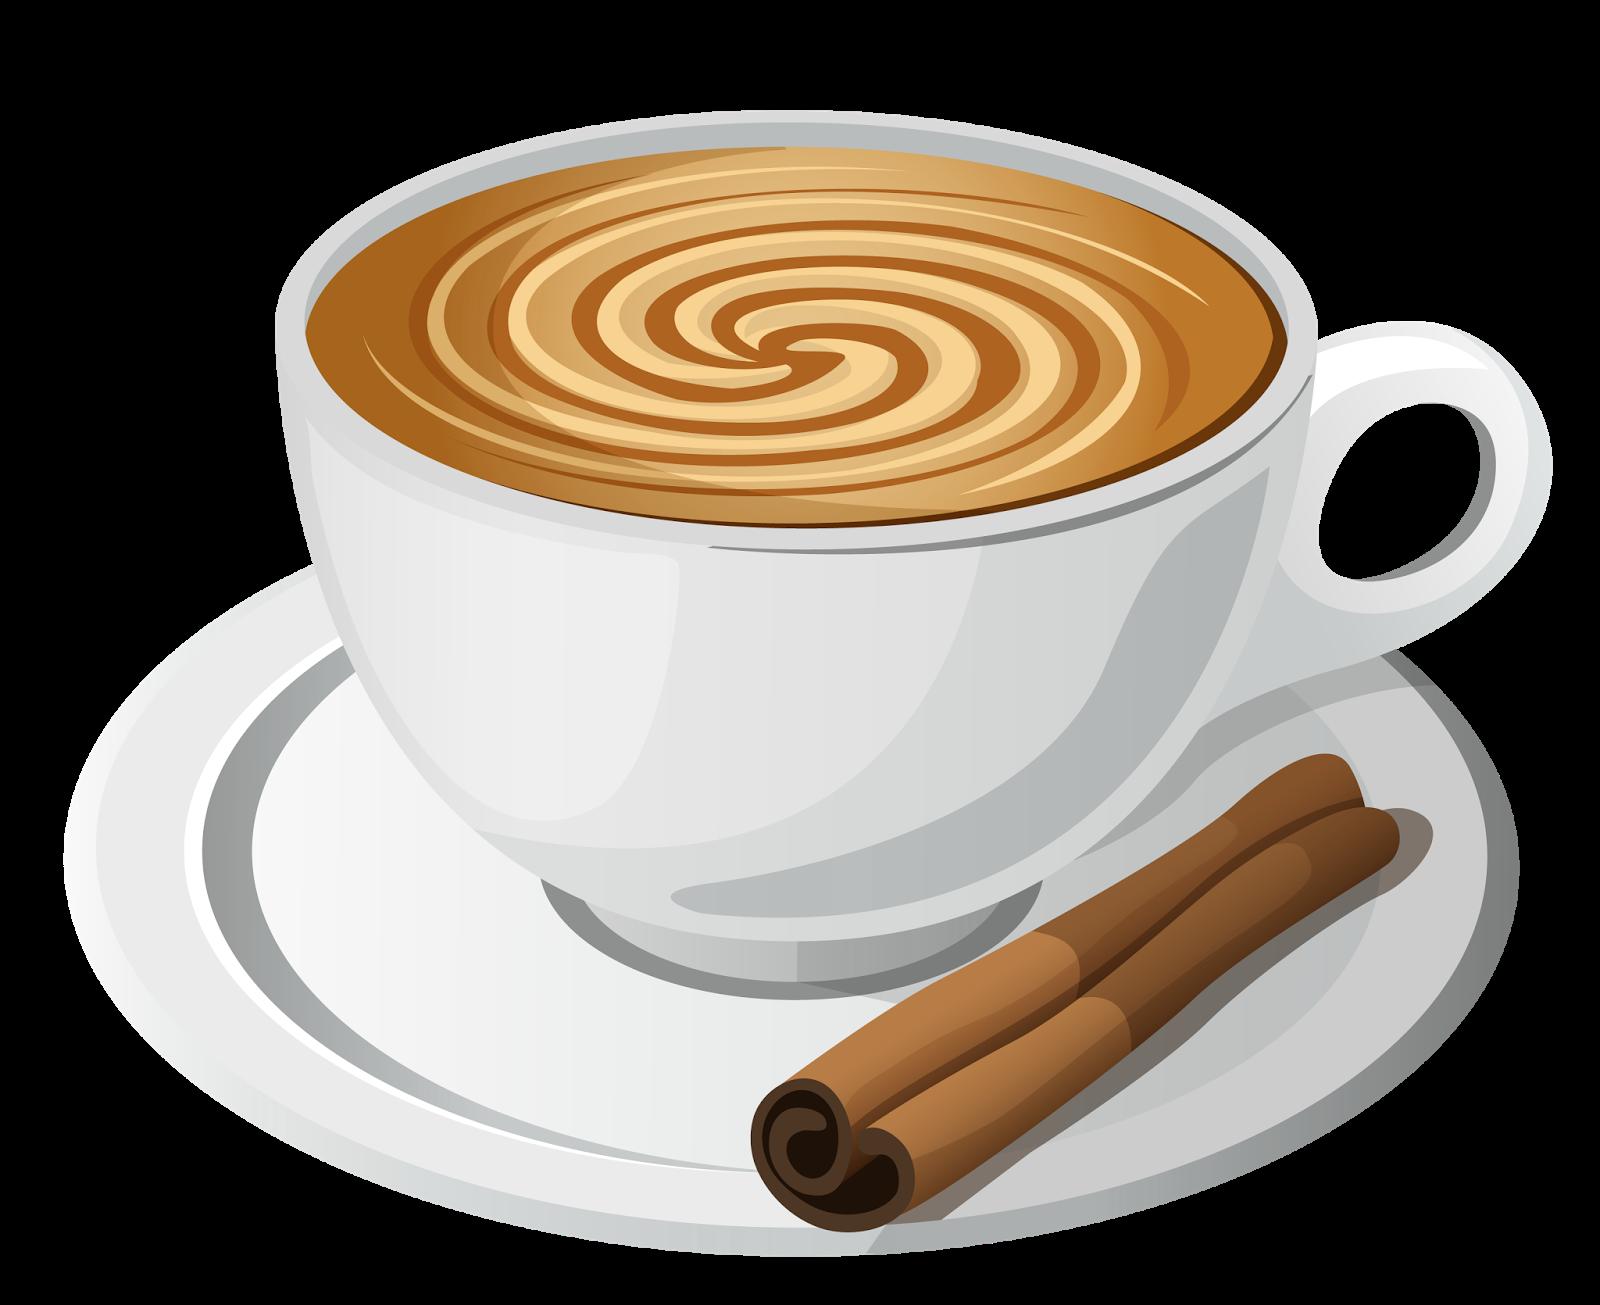 Hot mug of pumpkin latte transparent clipart clipart royalty free download On the Light Side: Beverages and Beyond clipart royalty free download